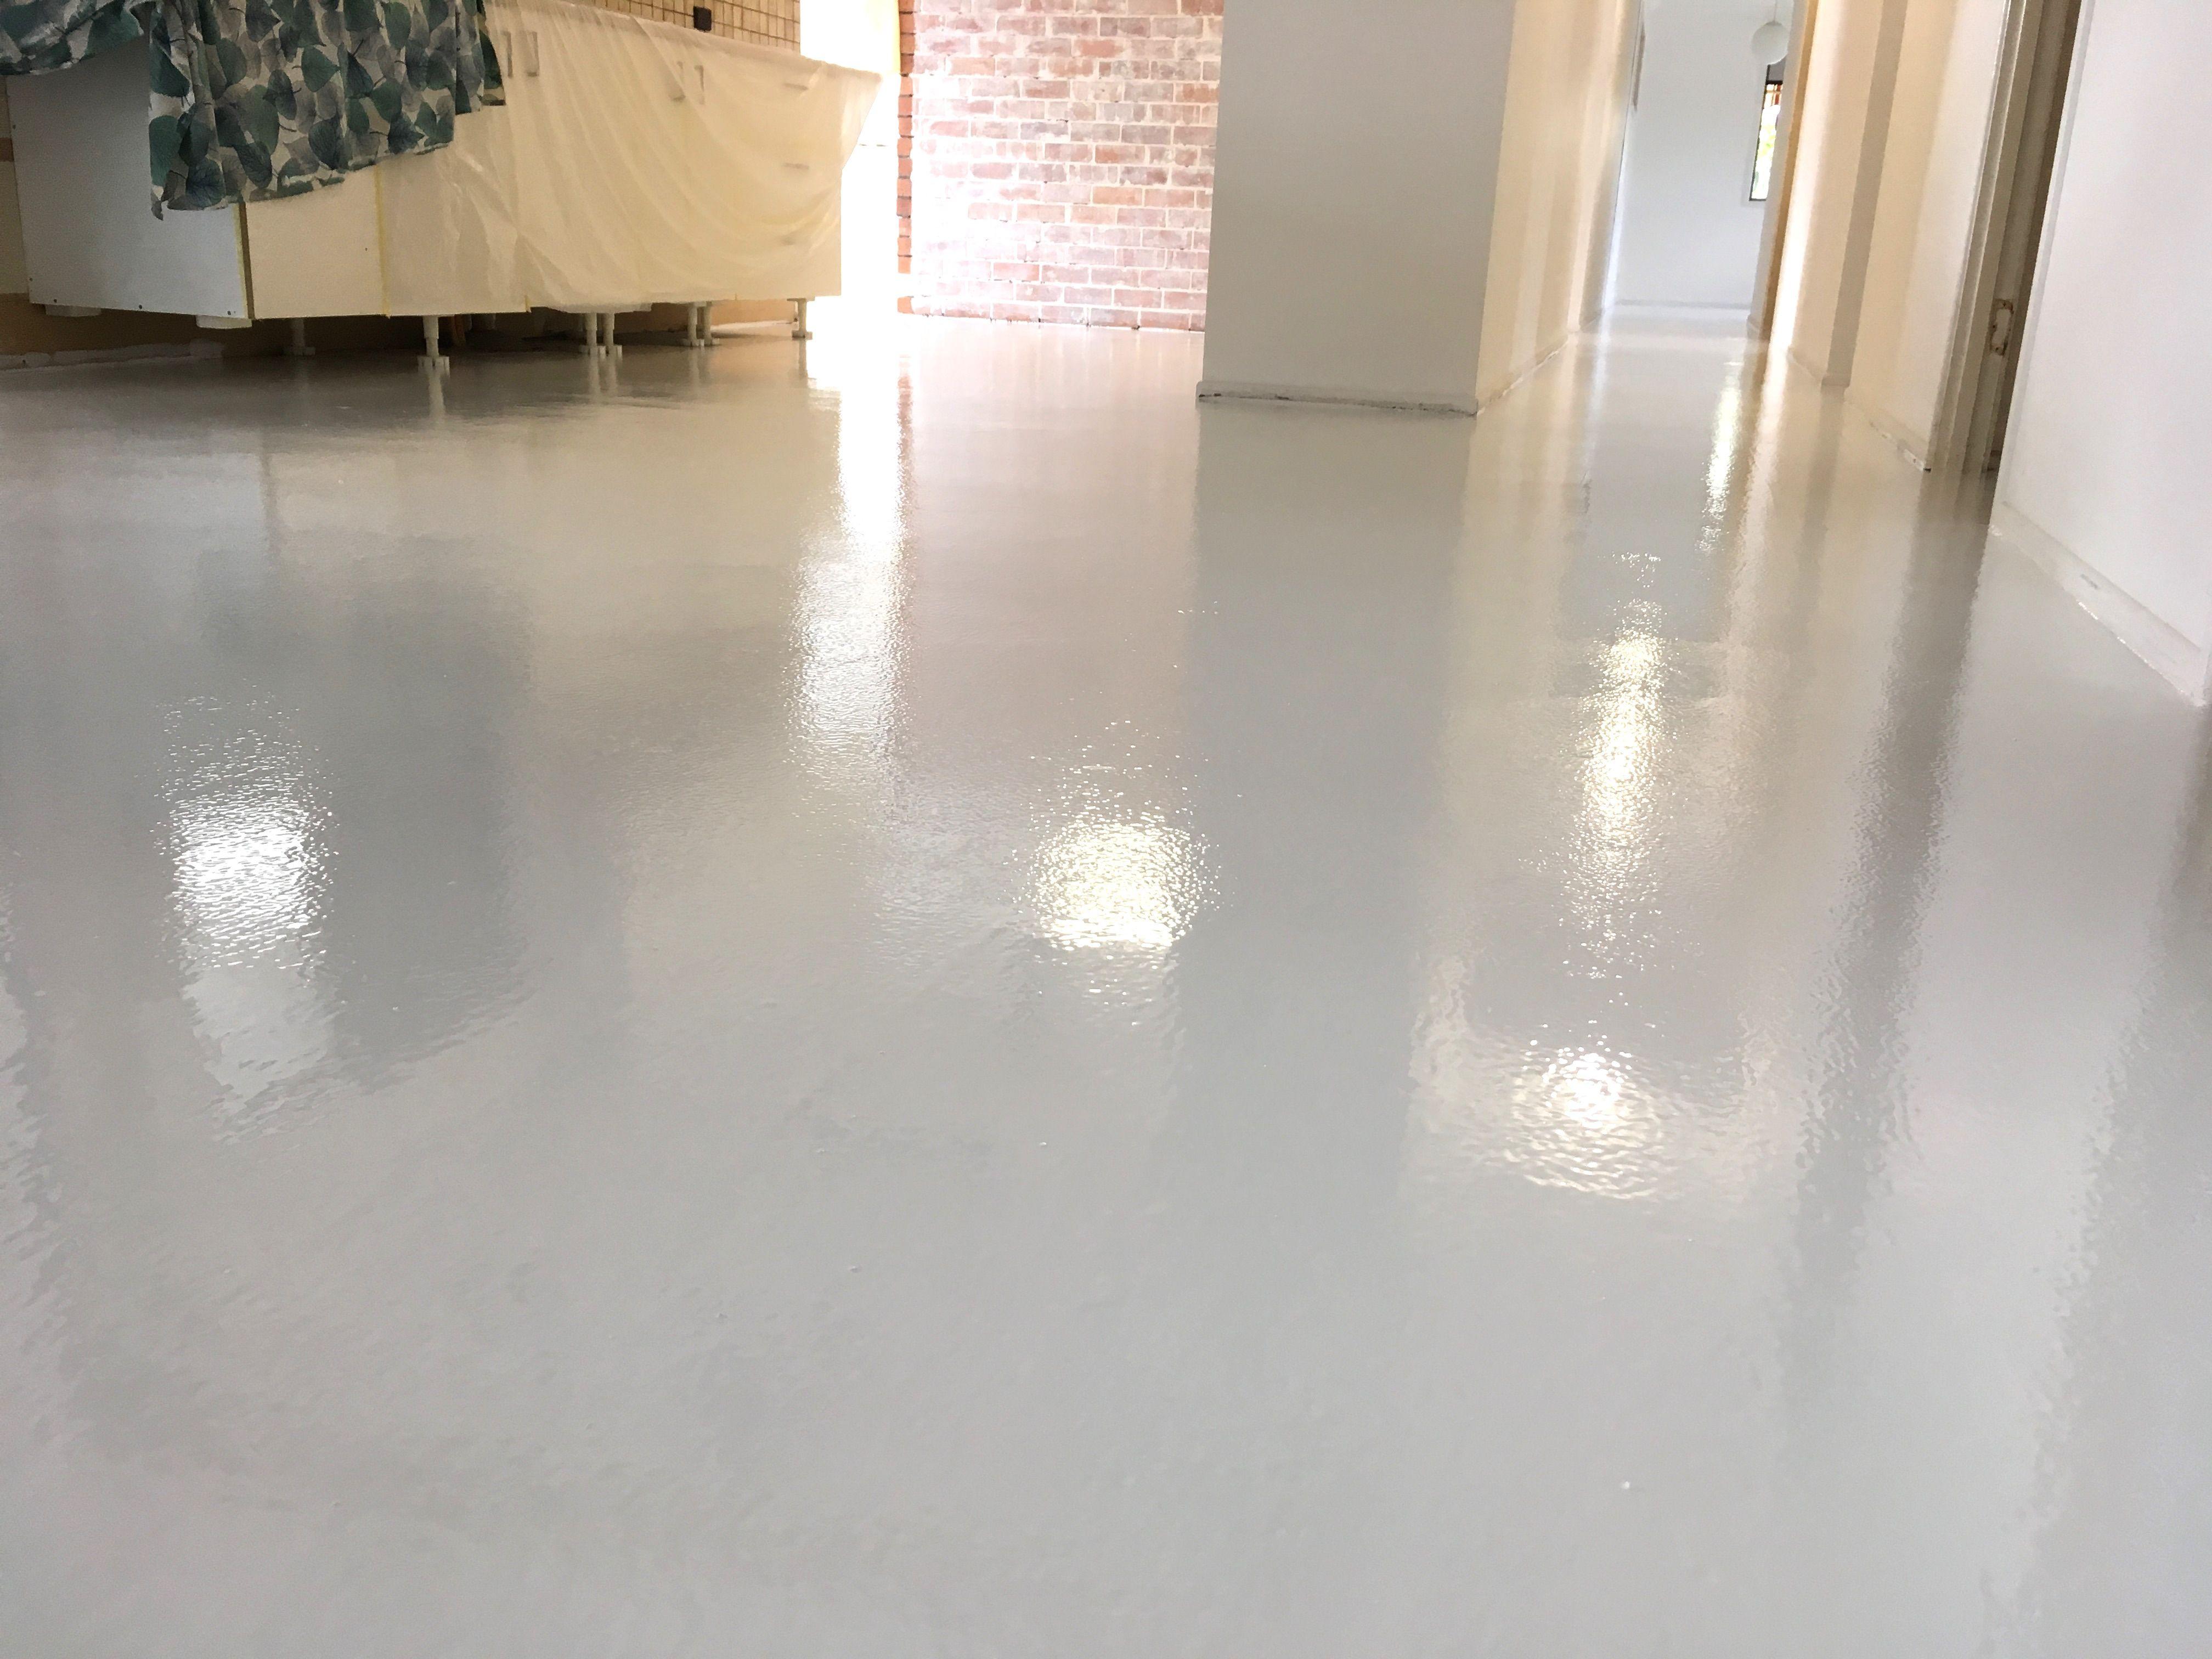 Epoxy Floor Sunshine Coast The Garage Floor Co Noosa To Brisbane Call Us For A Free Fun Colour Consultation Epoxy Floor Metallic Epoxy Floor Garage Floor